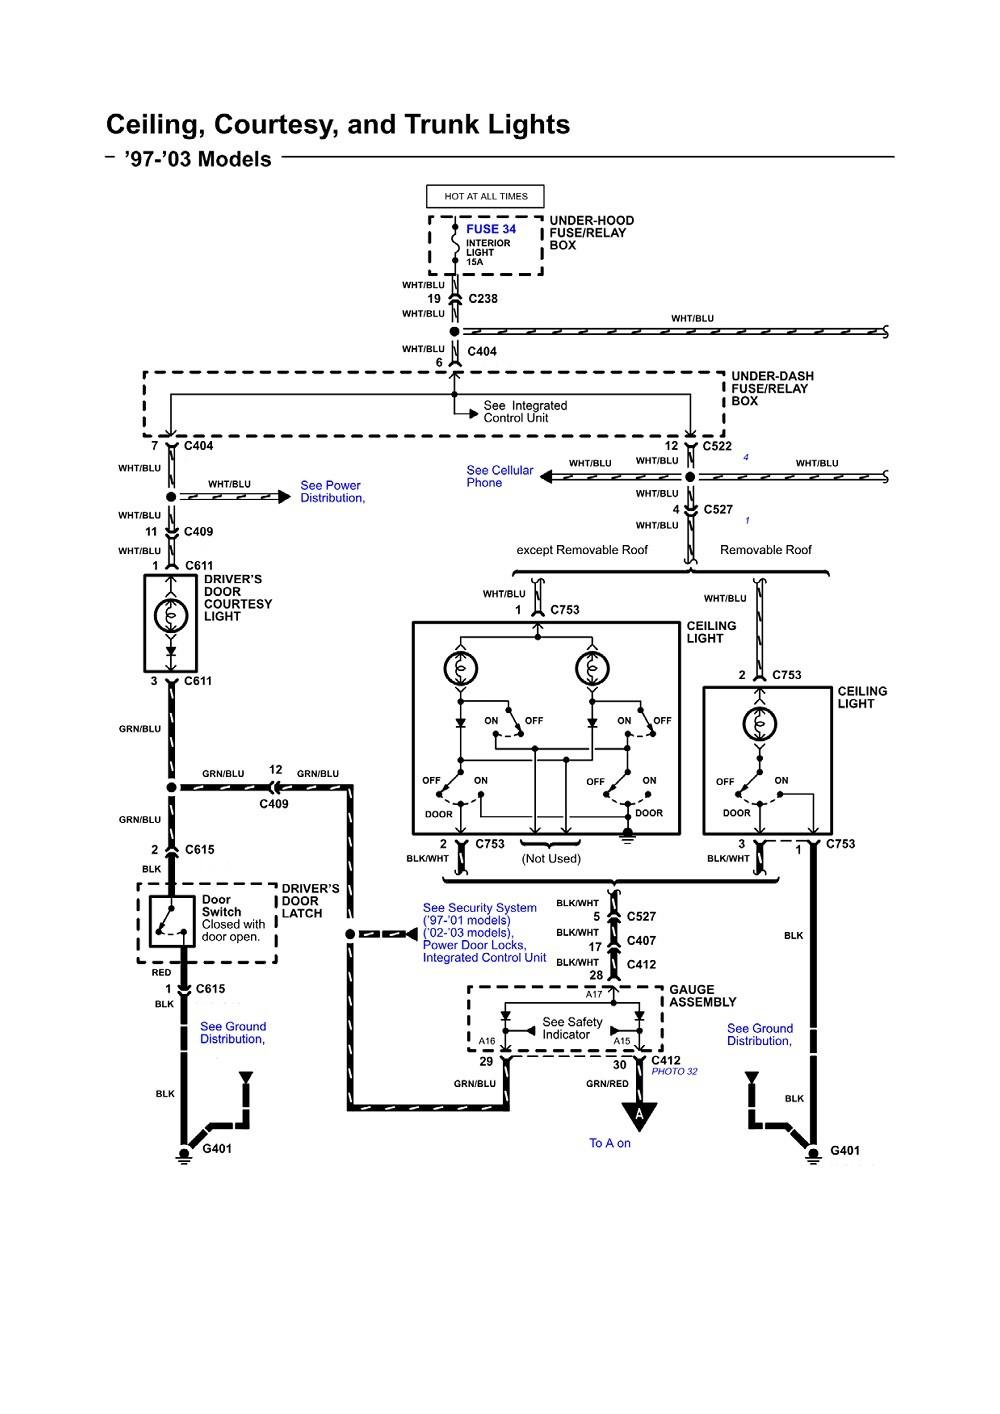 [DIAGRAM] Taurus Fan Wiring Diagram Hecho FULL Version HD